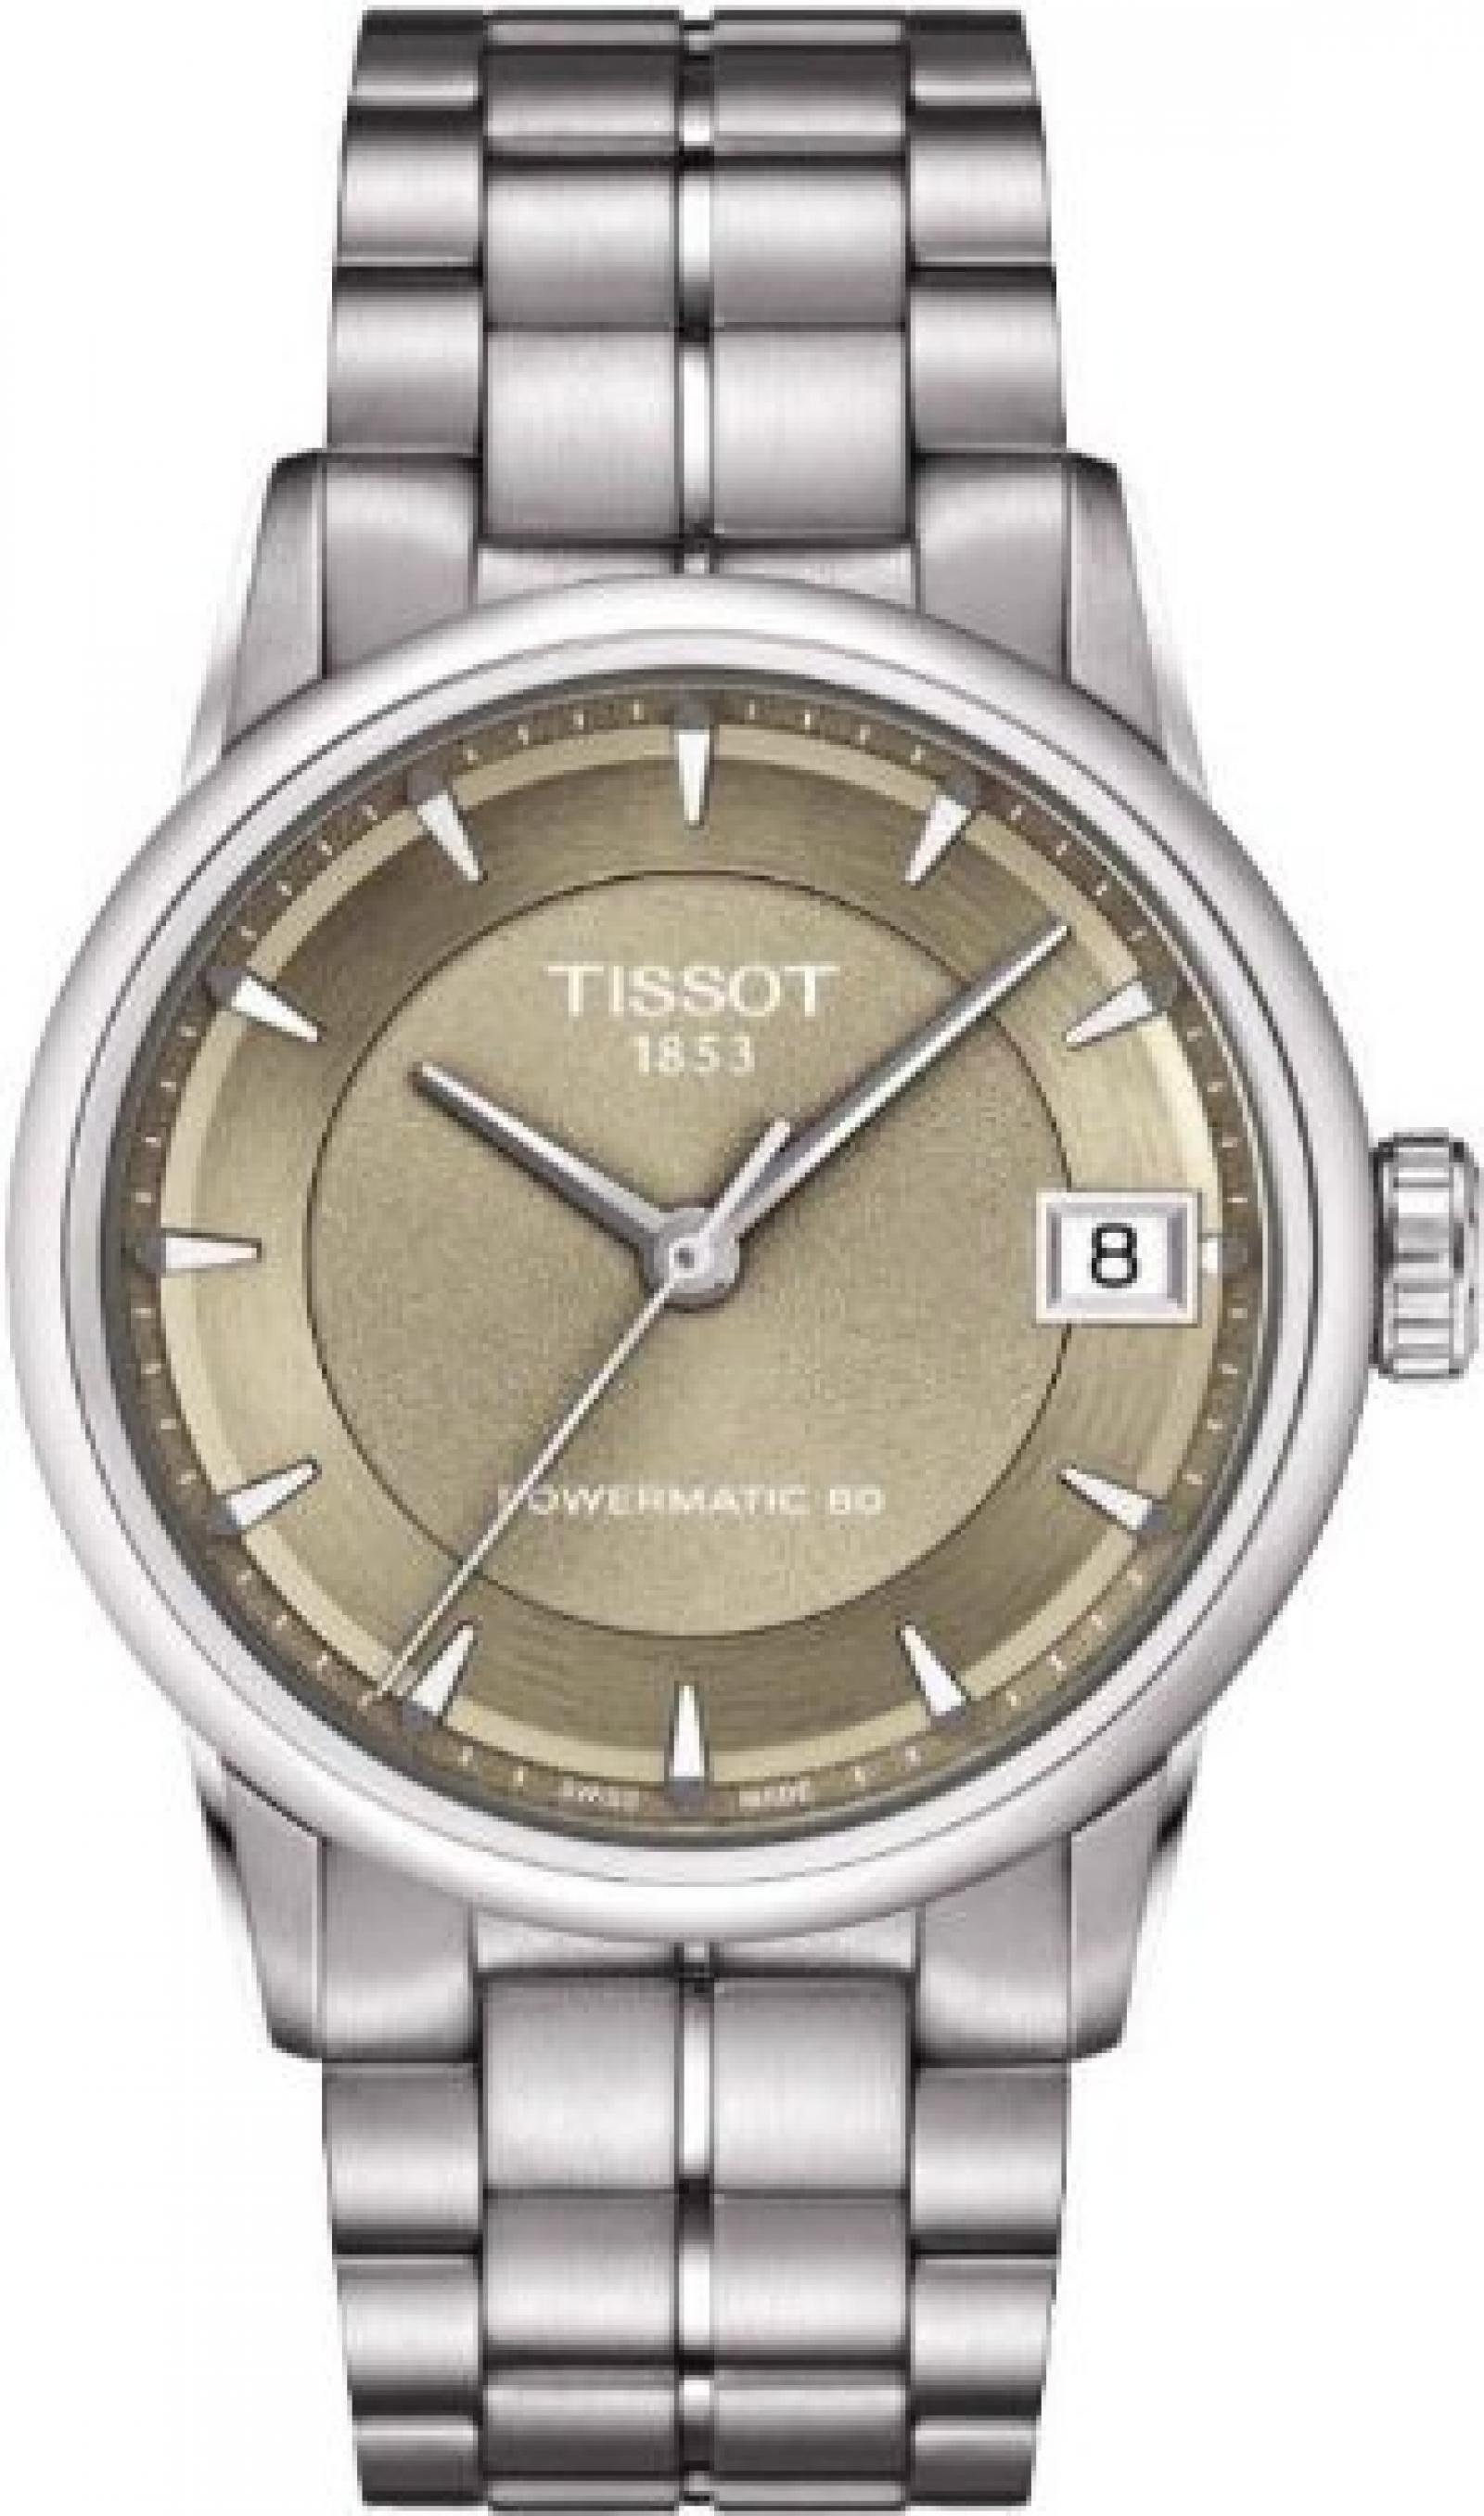 Tissot T-Classic Luxury Automatic T086.207.11.301.00